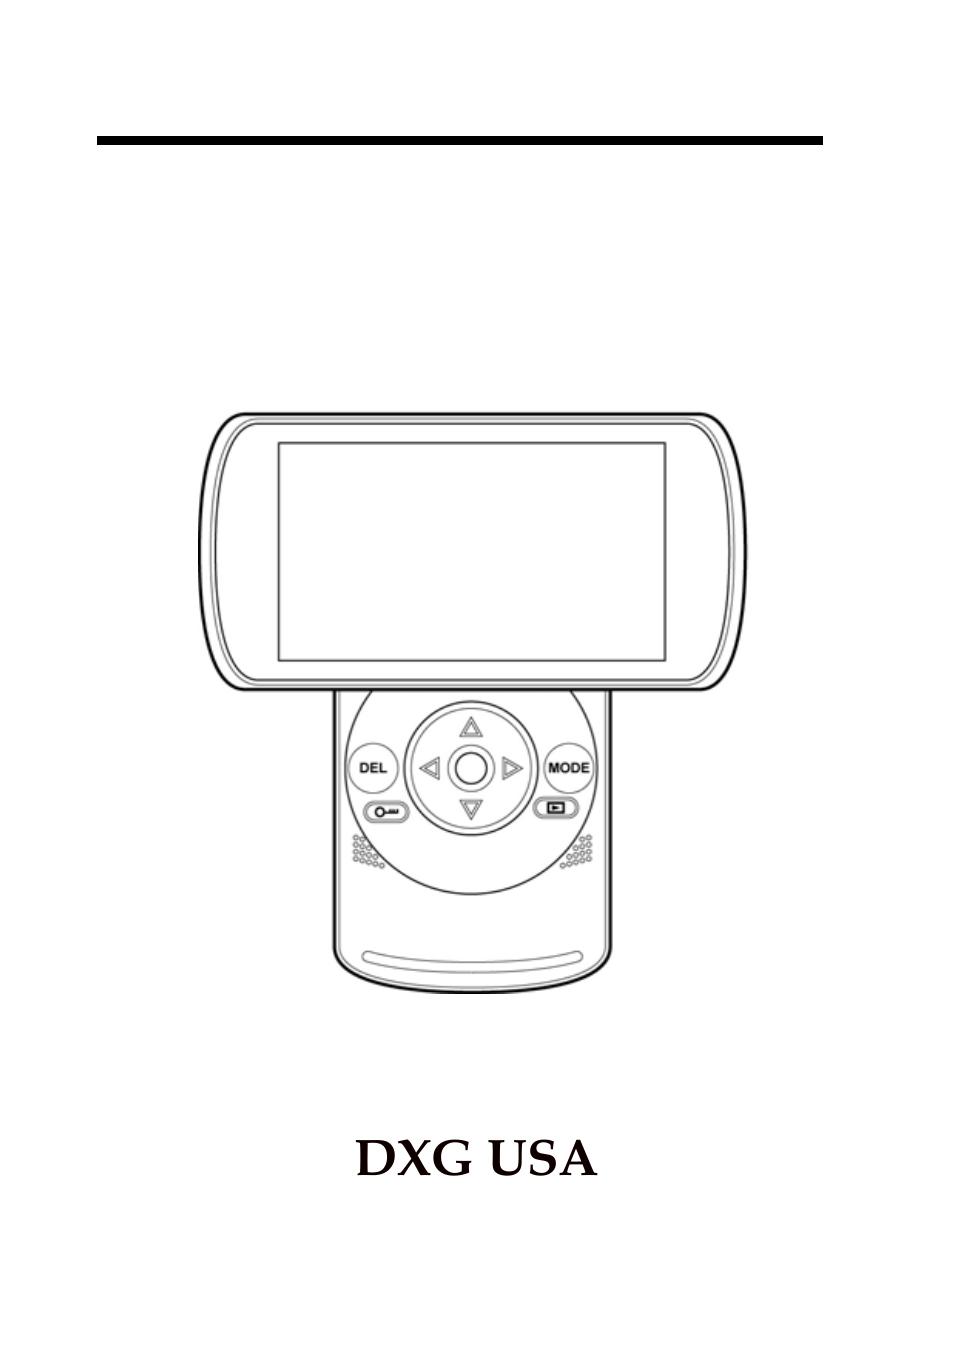 dxg technology twist hd dxg 599v user manual 34 pages rh manualsdir com DXG -572V Manual DXG -572V Manual